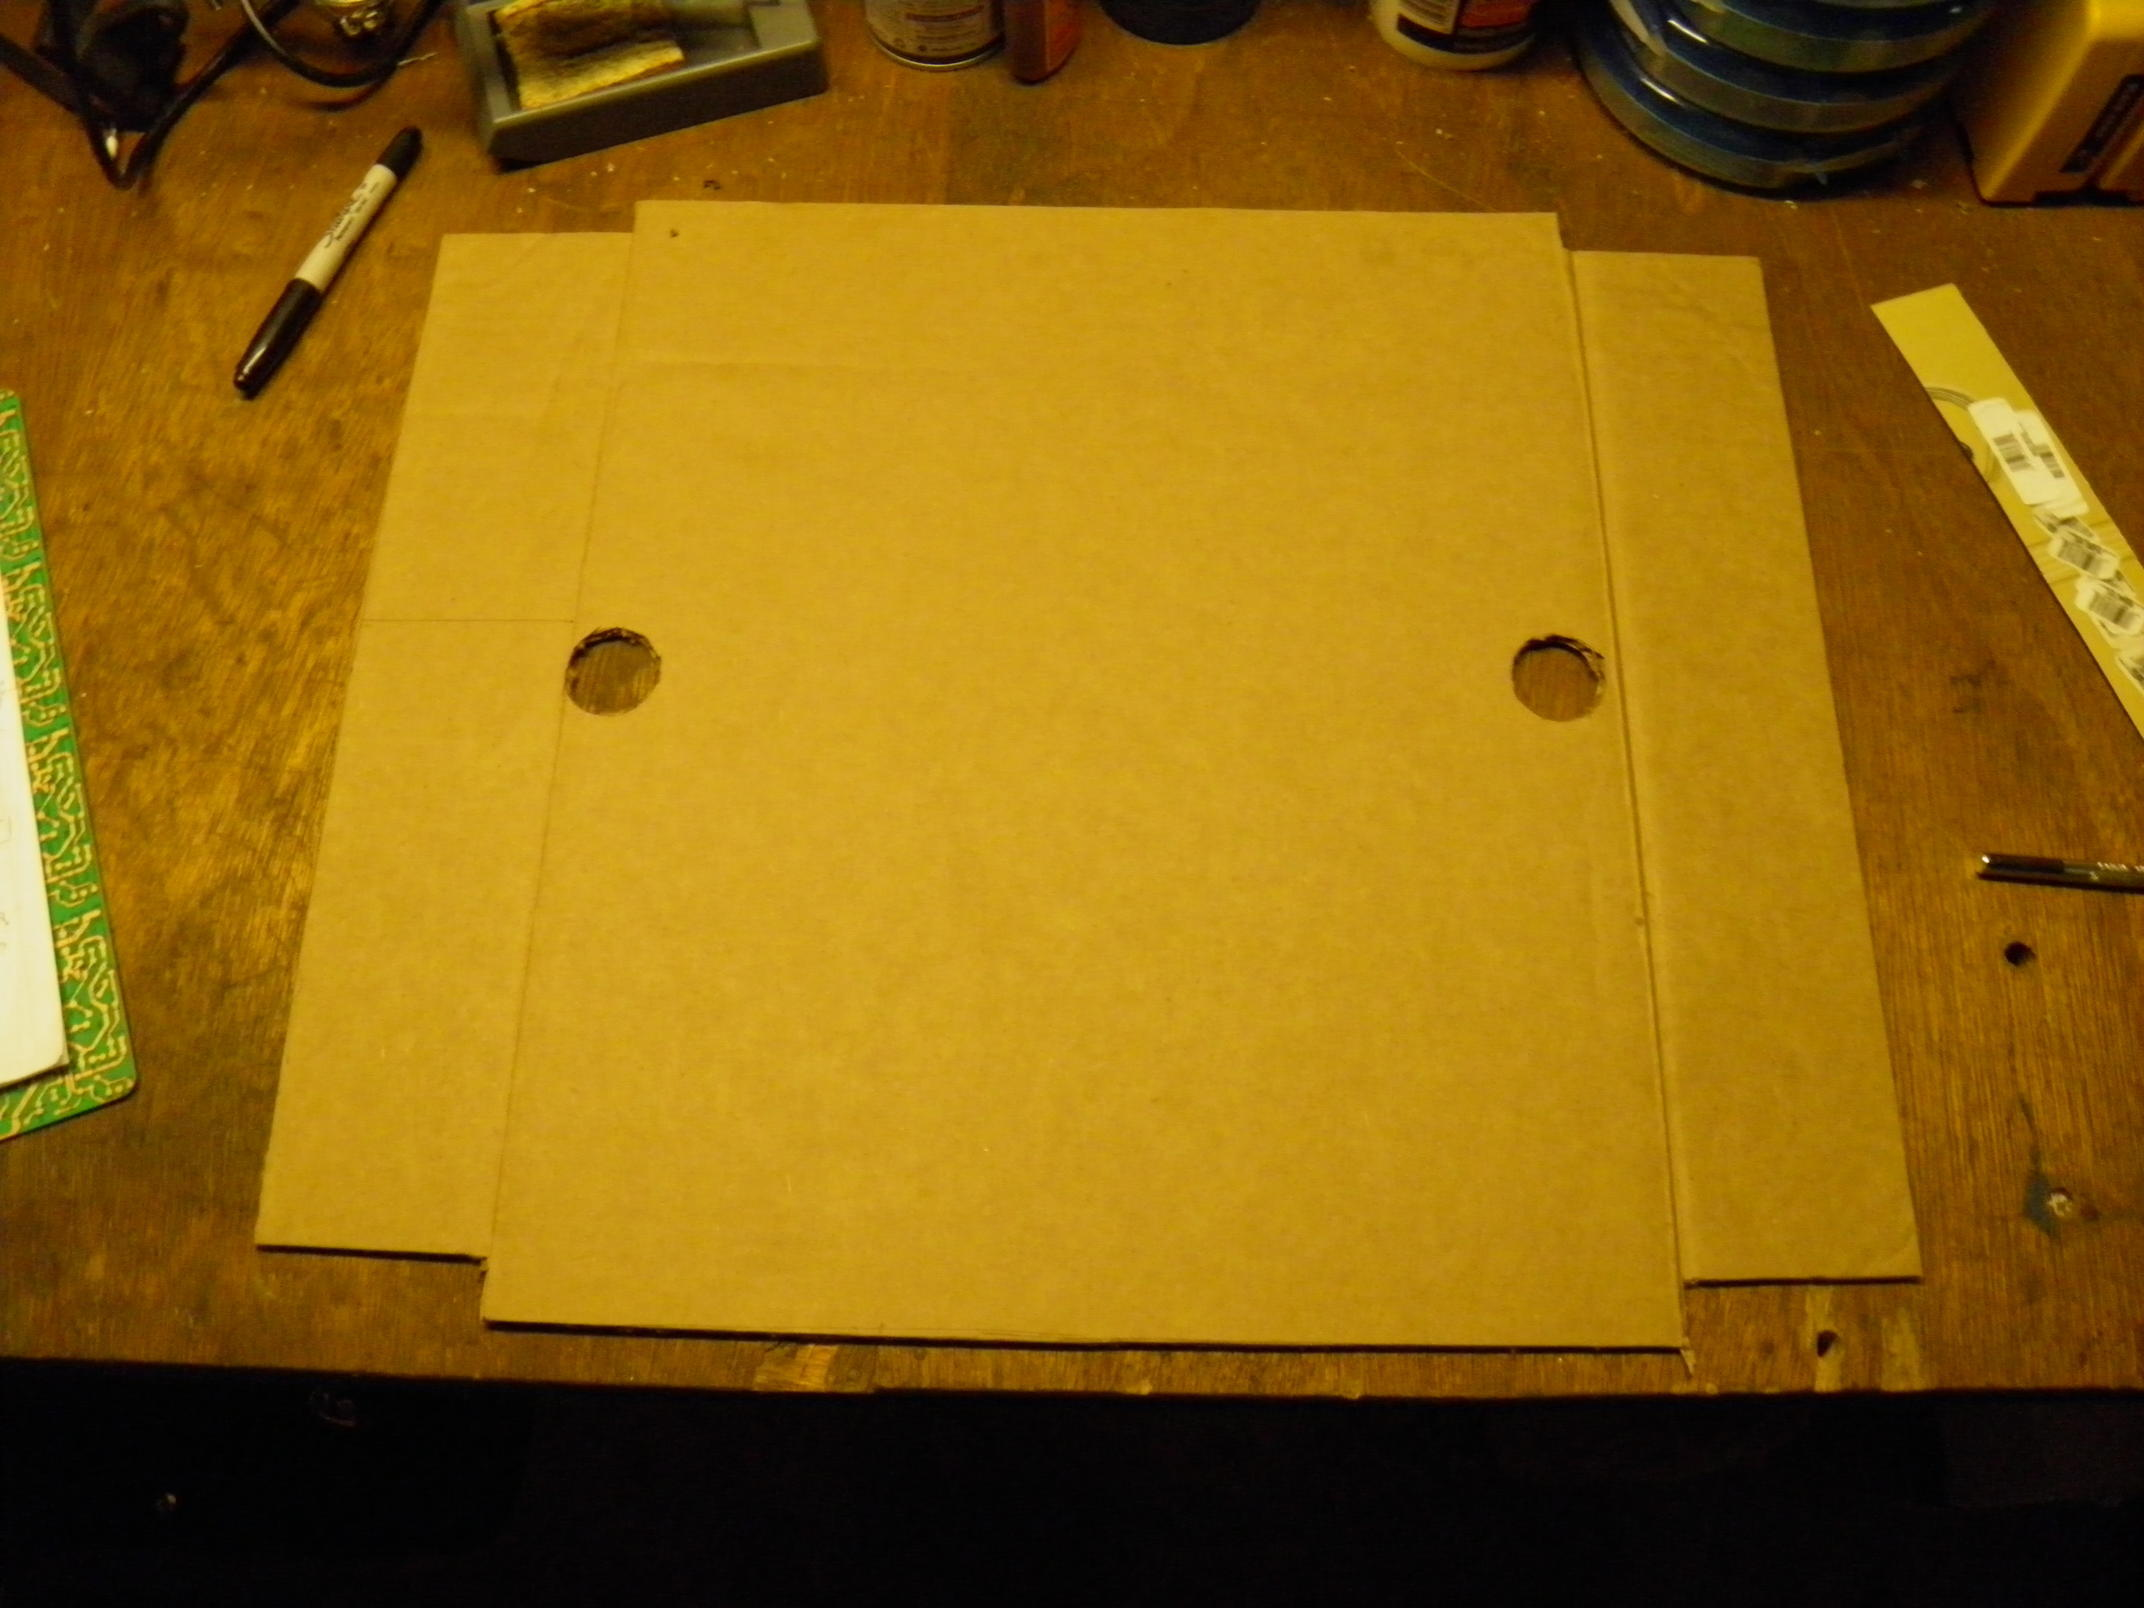 Reflector Cardboard Cut with Knife